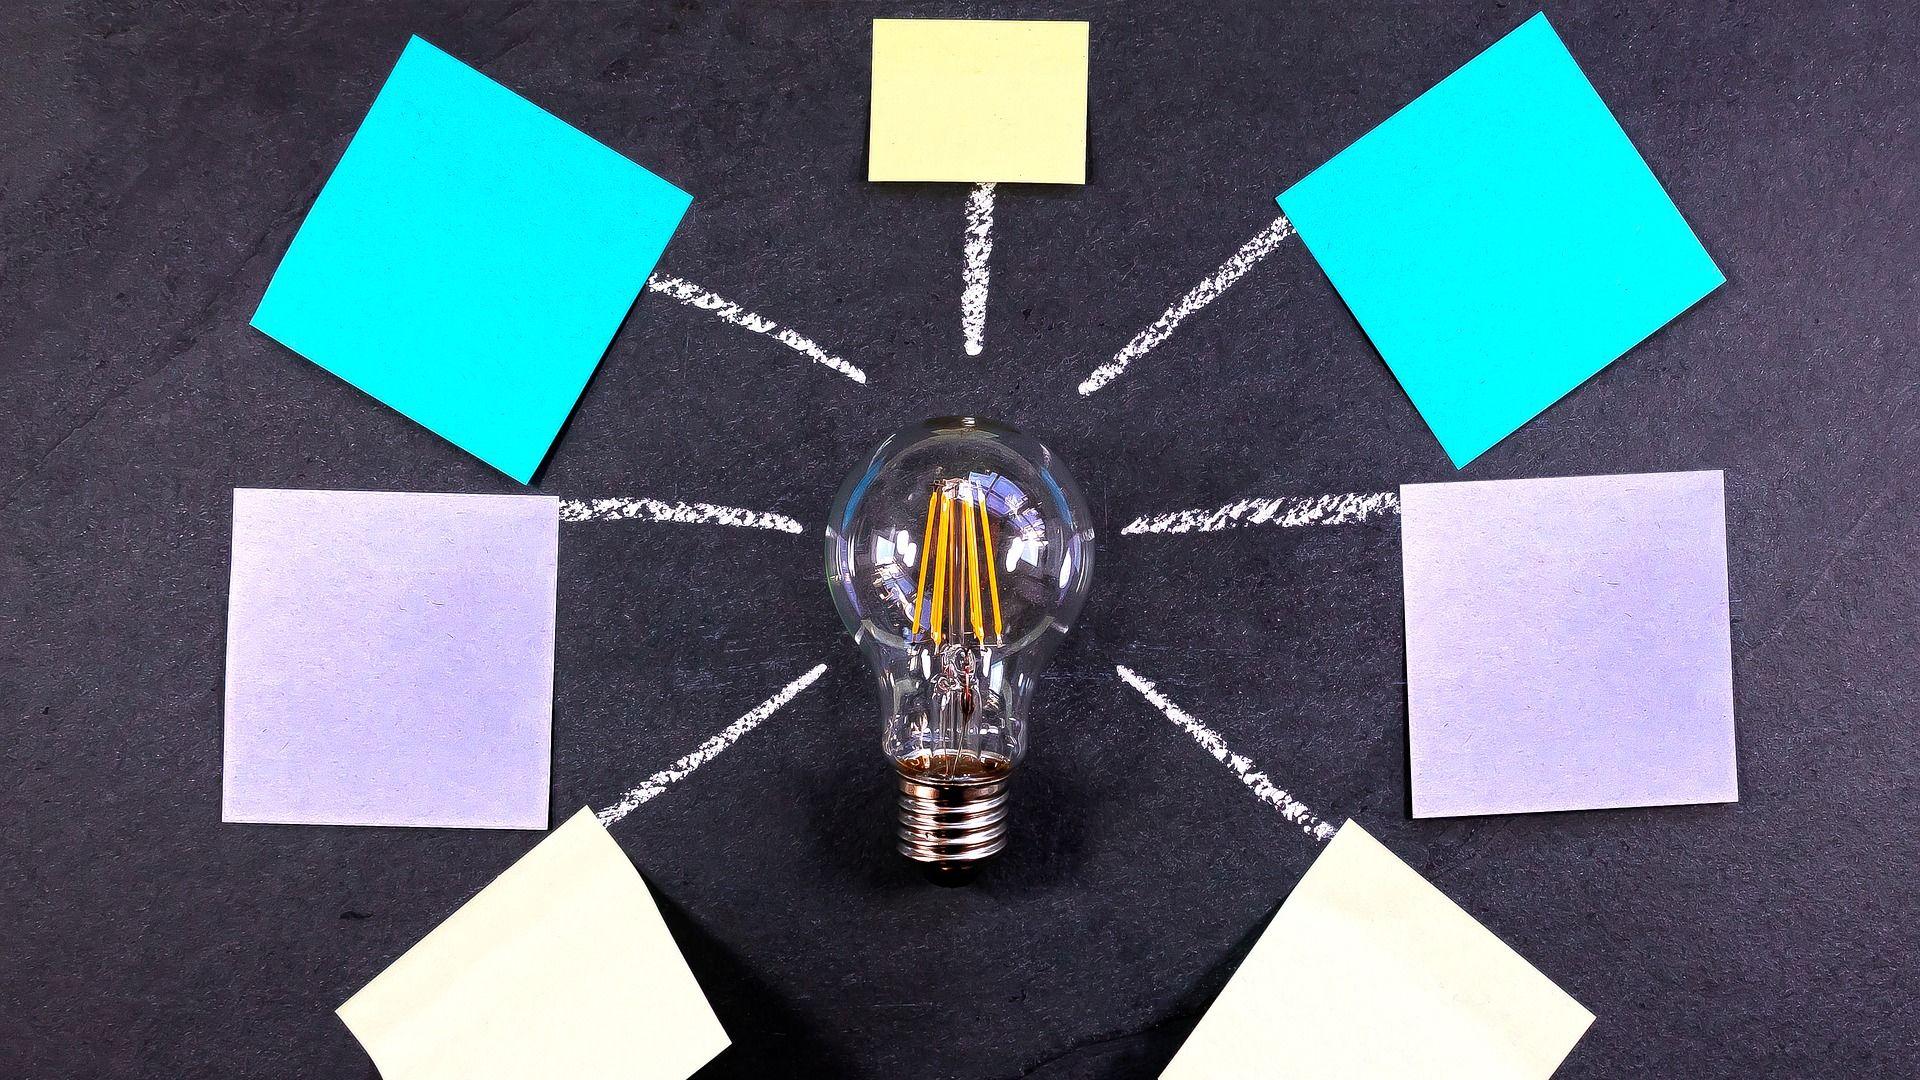 dh Labs: Dunnhumby gründet Innovationsabteilung